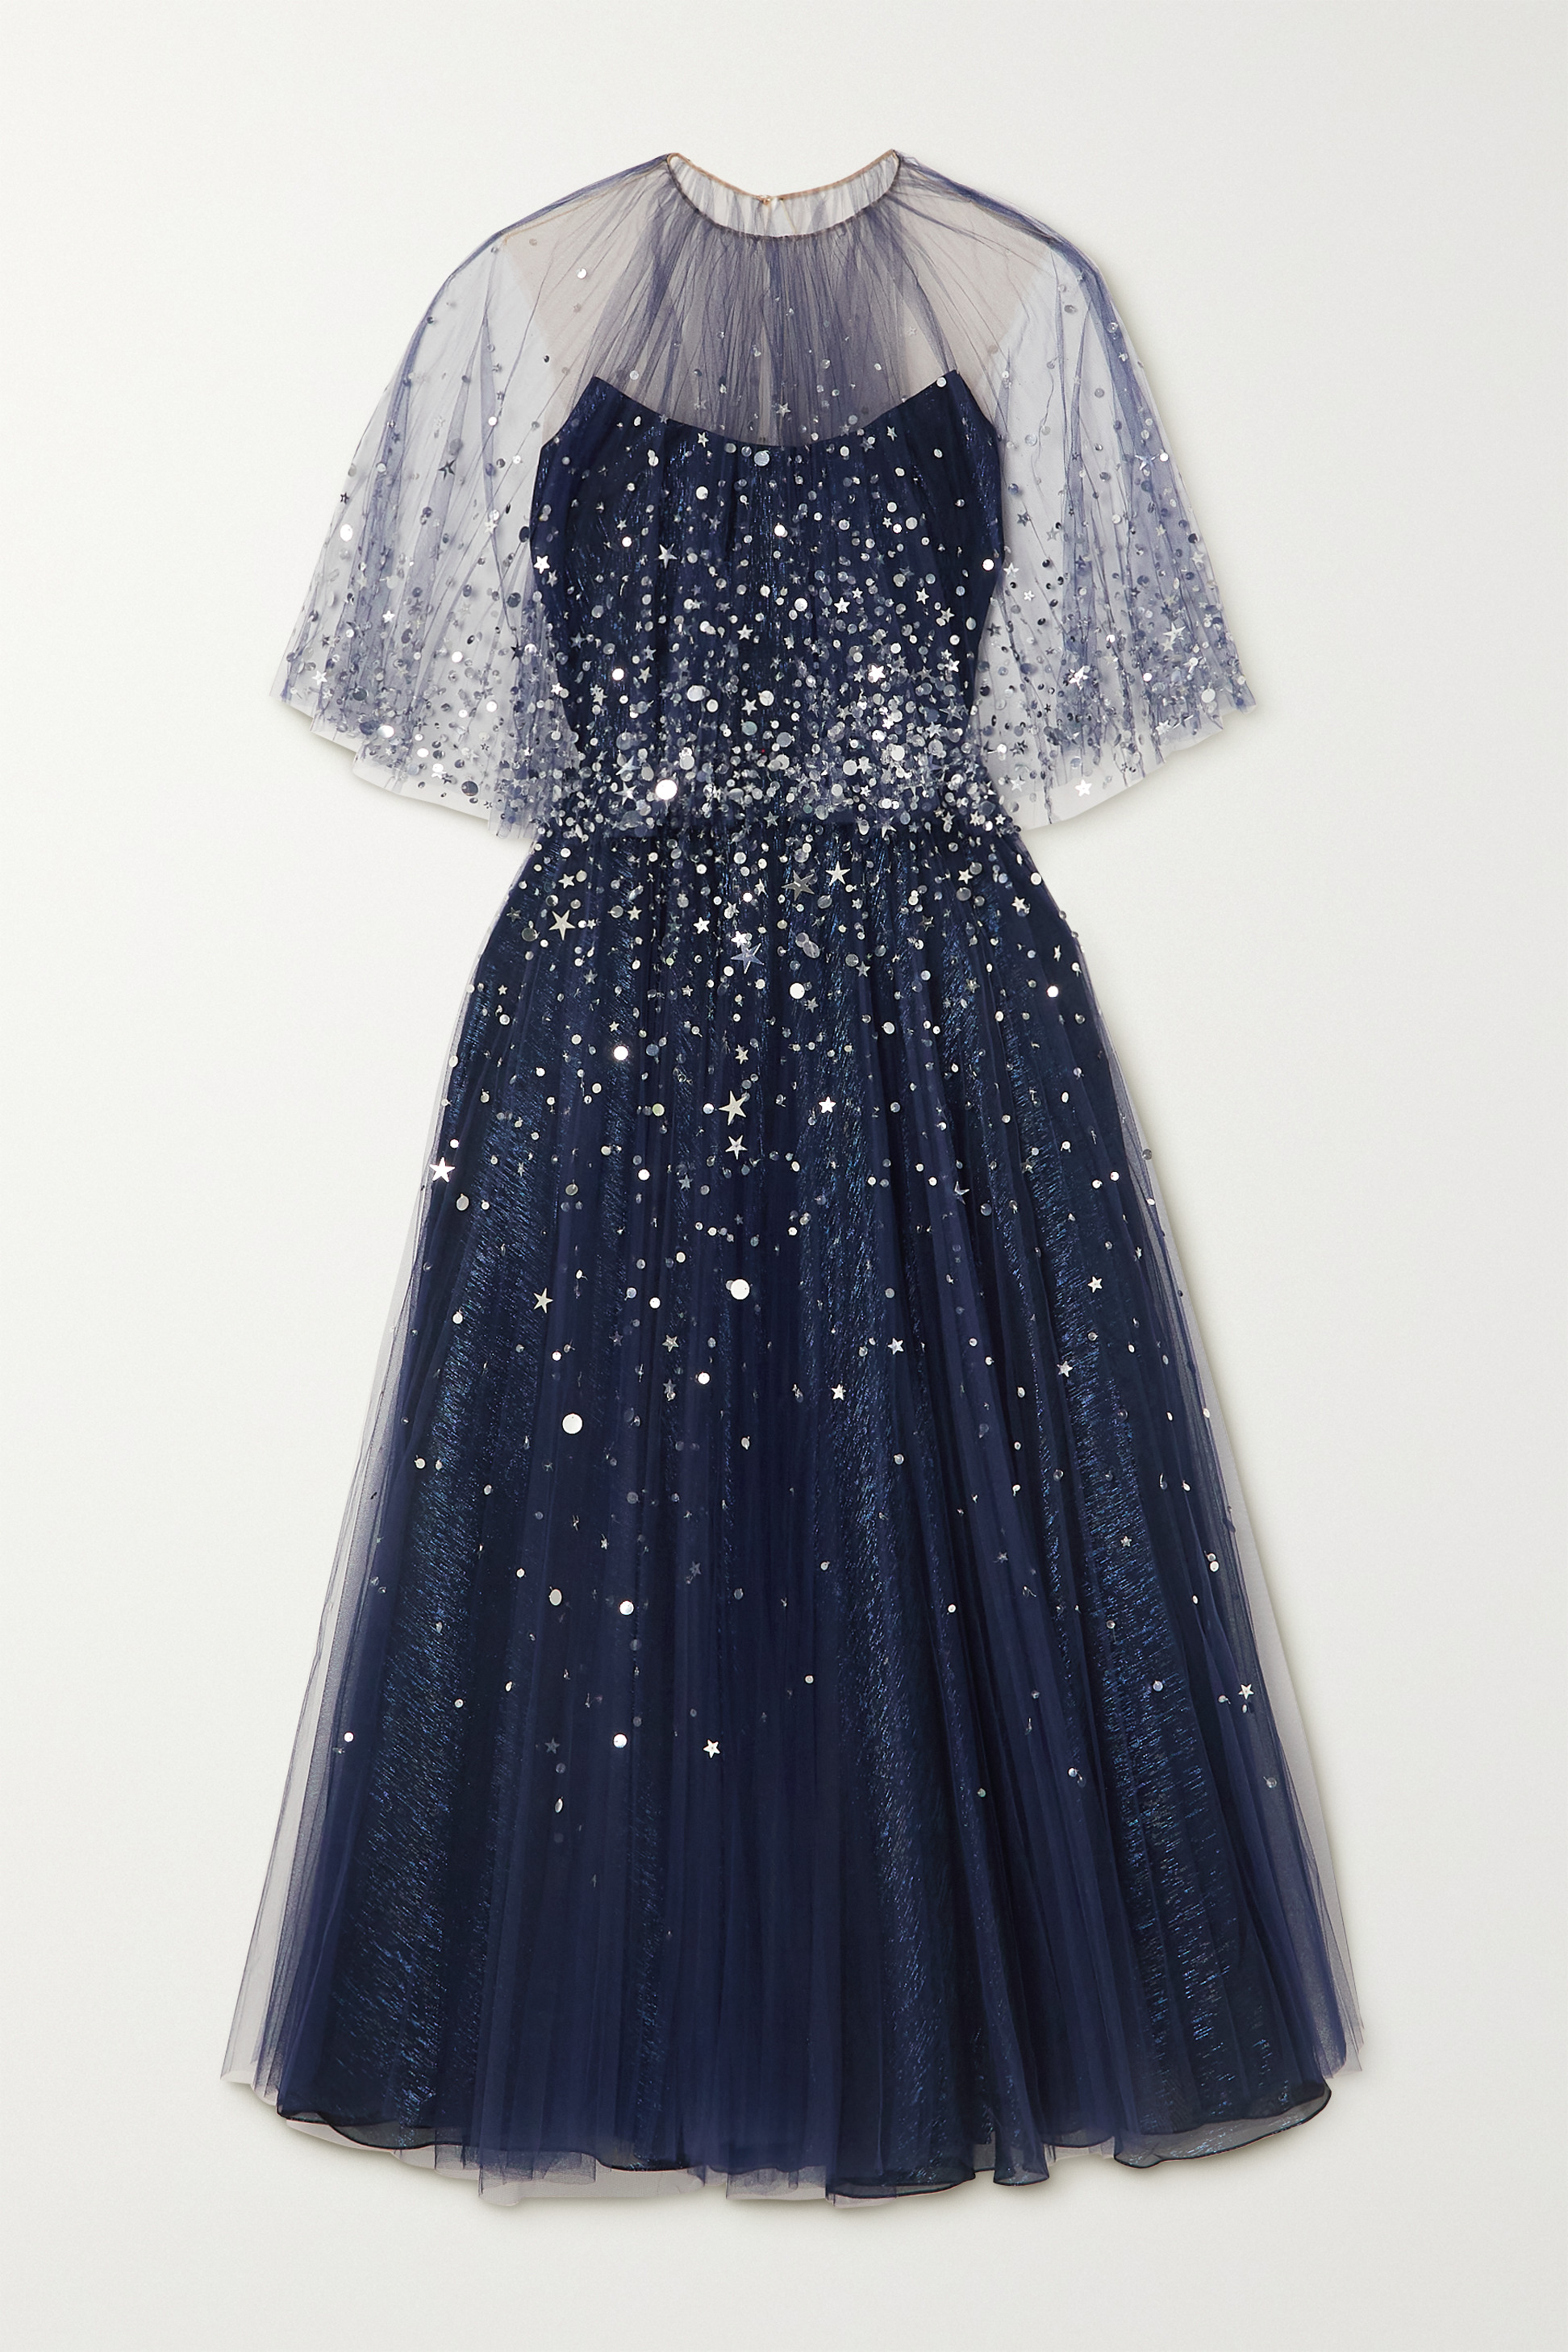 Net-a-Porter celebrates modest fashion ahead of Ramadan (фото 10)